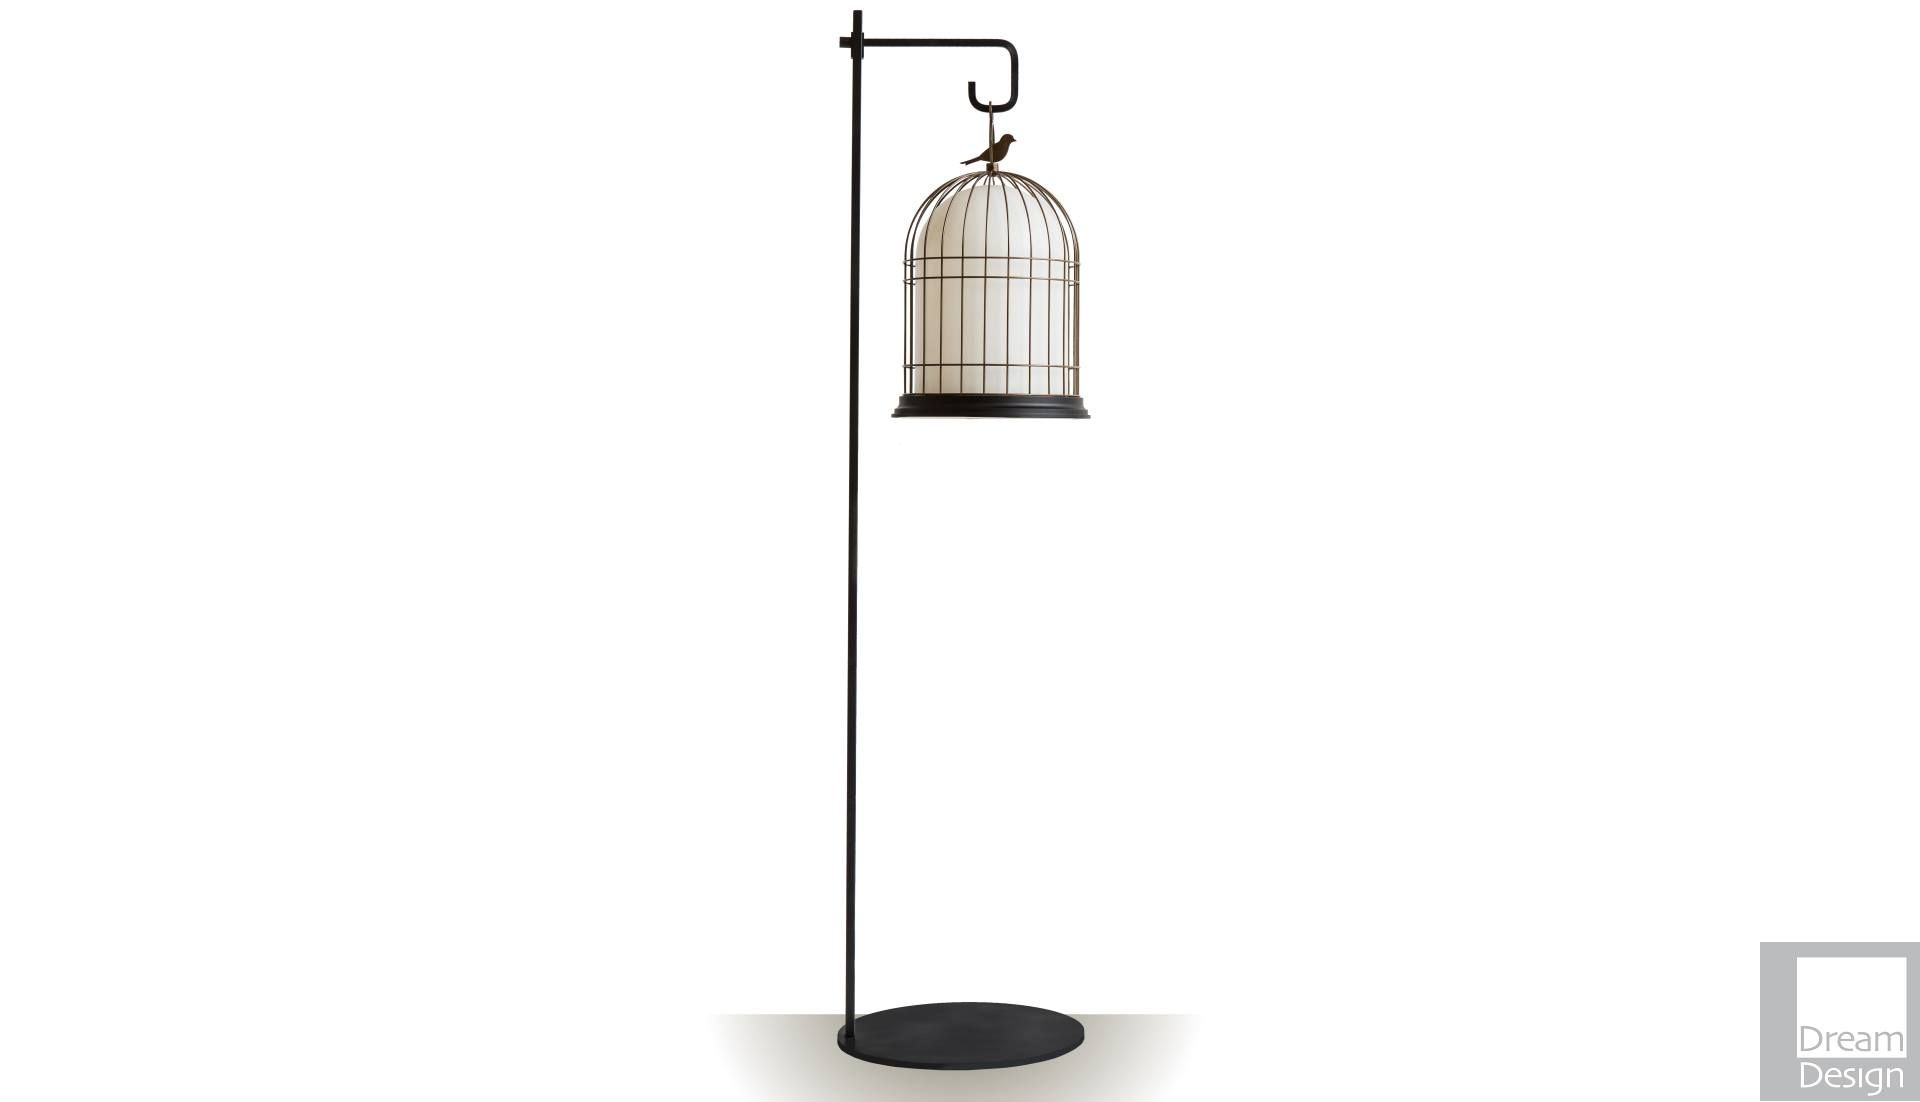 Contardi Freedom Light by Massimiliano